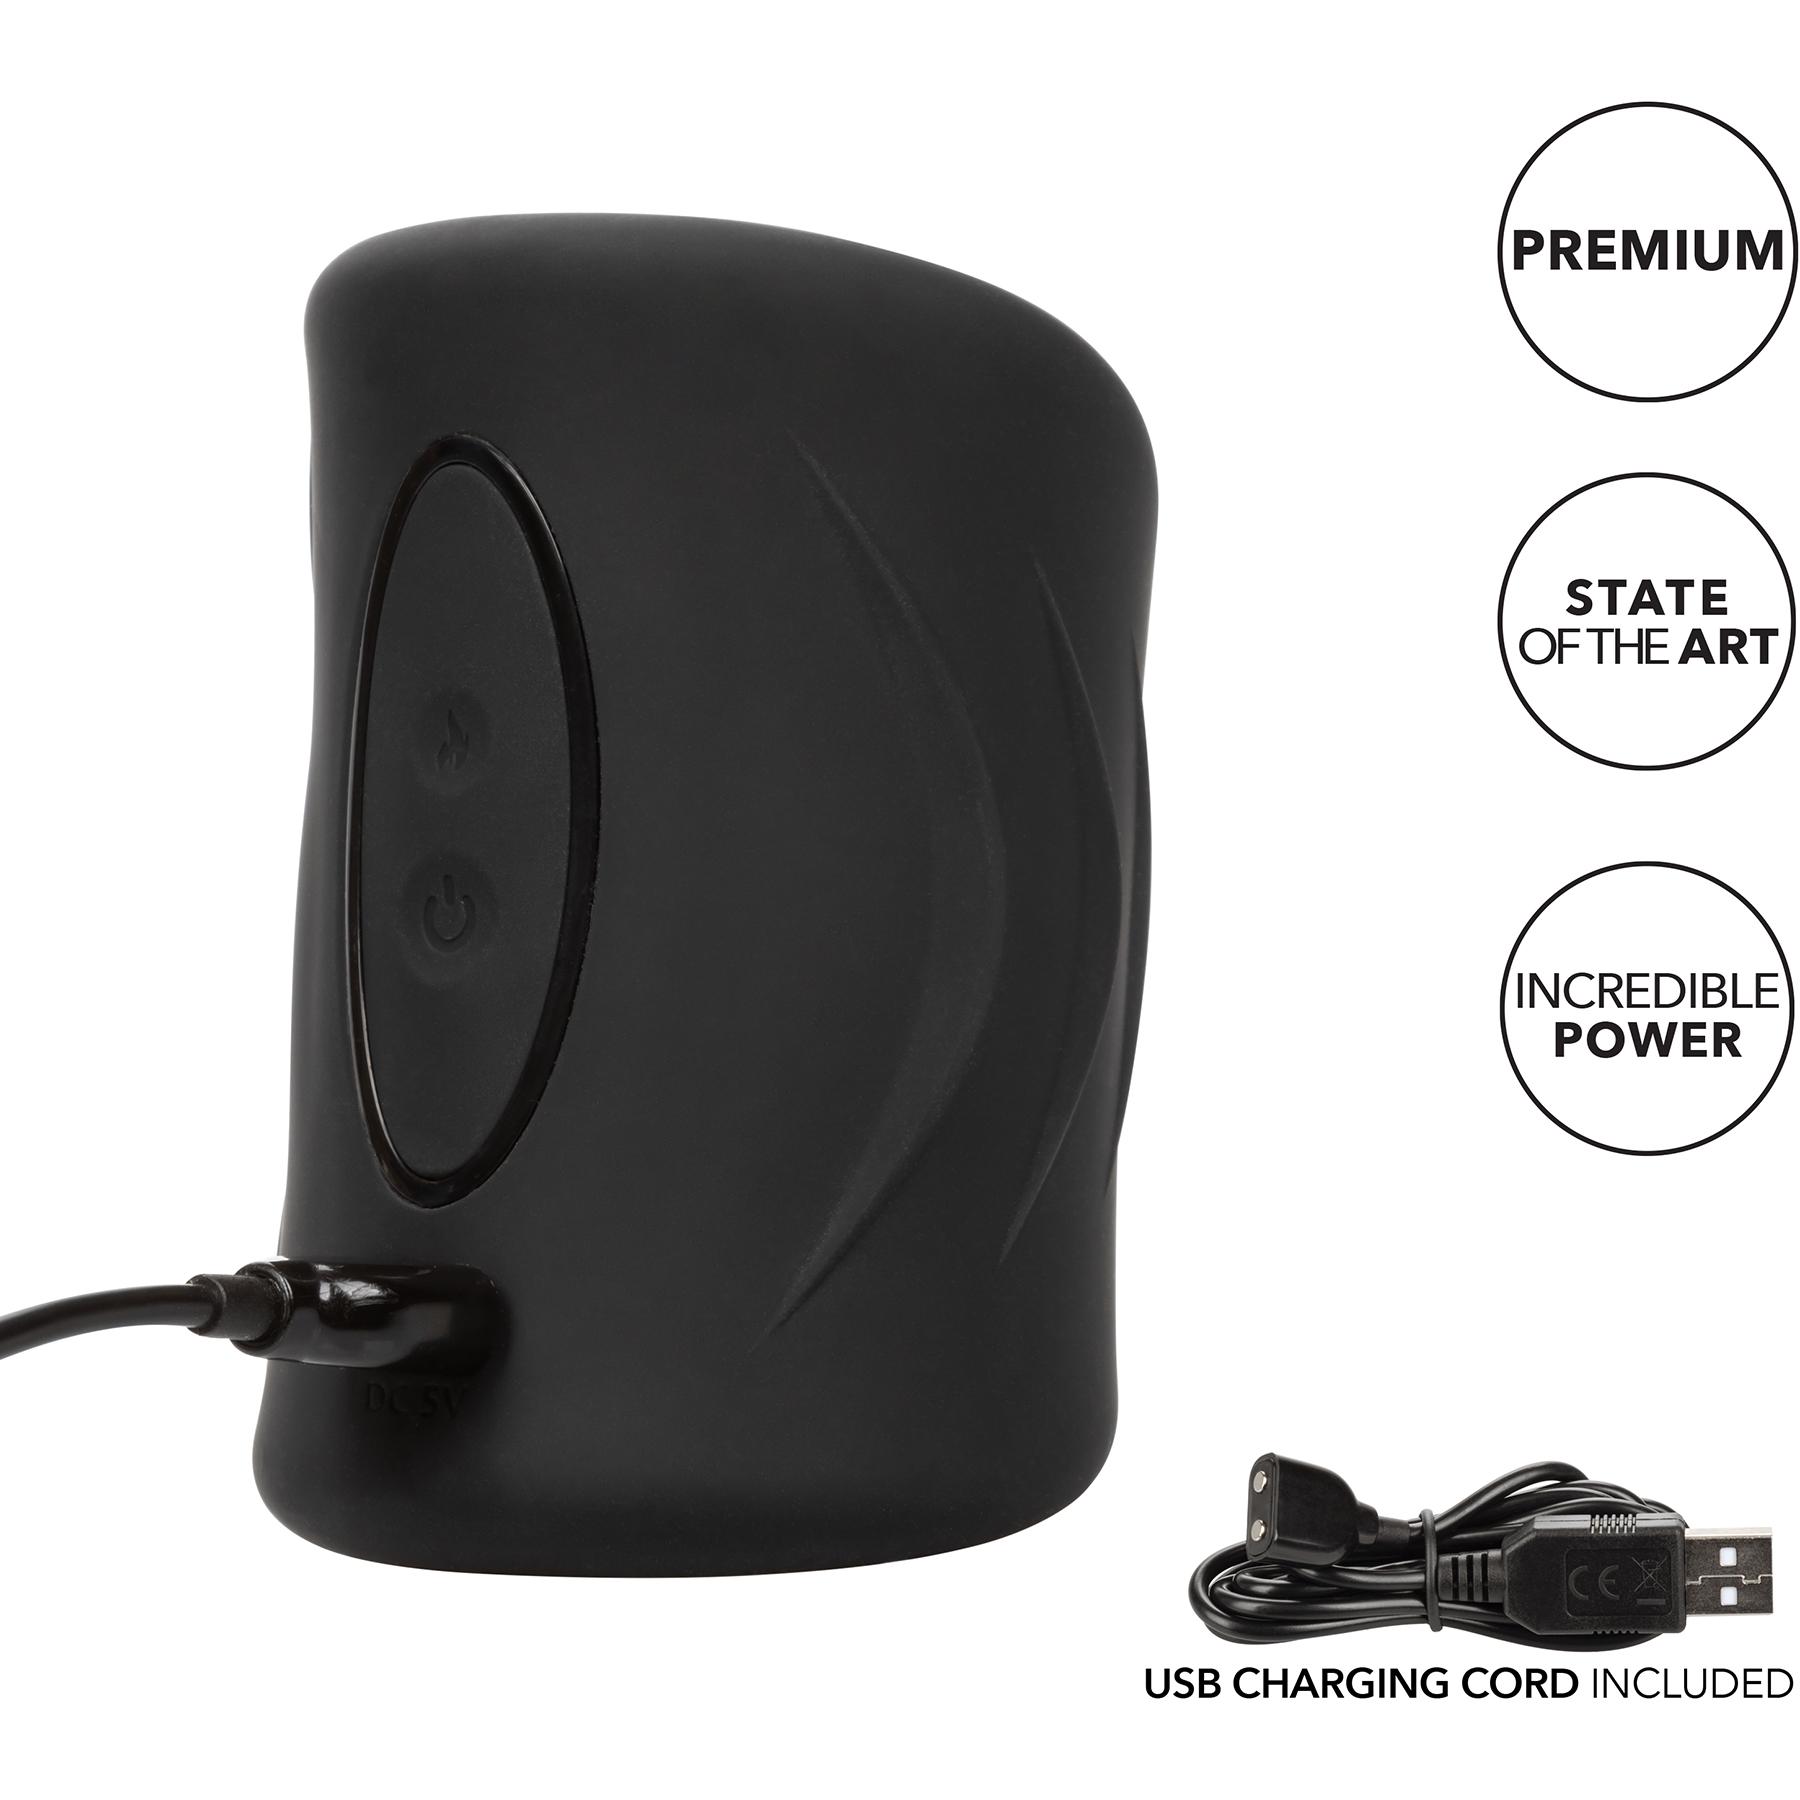 Optimum Power Pro Stroker Silicone Rechargeable Penis Masturbator - Charging